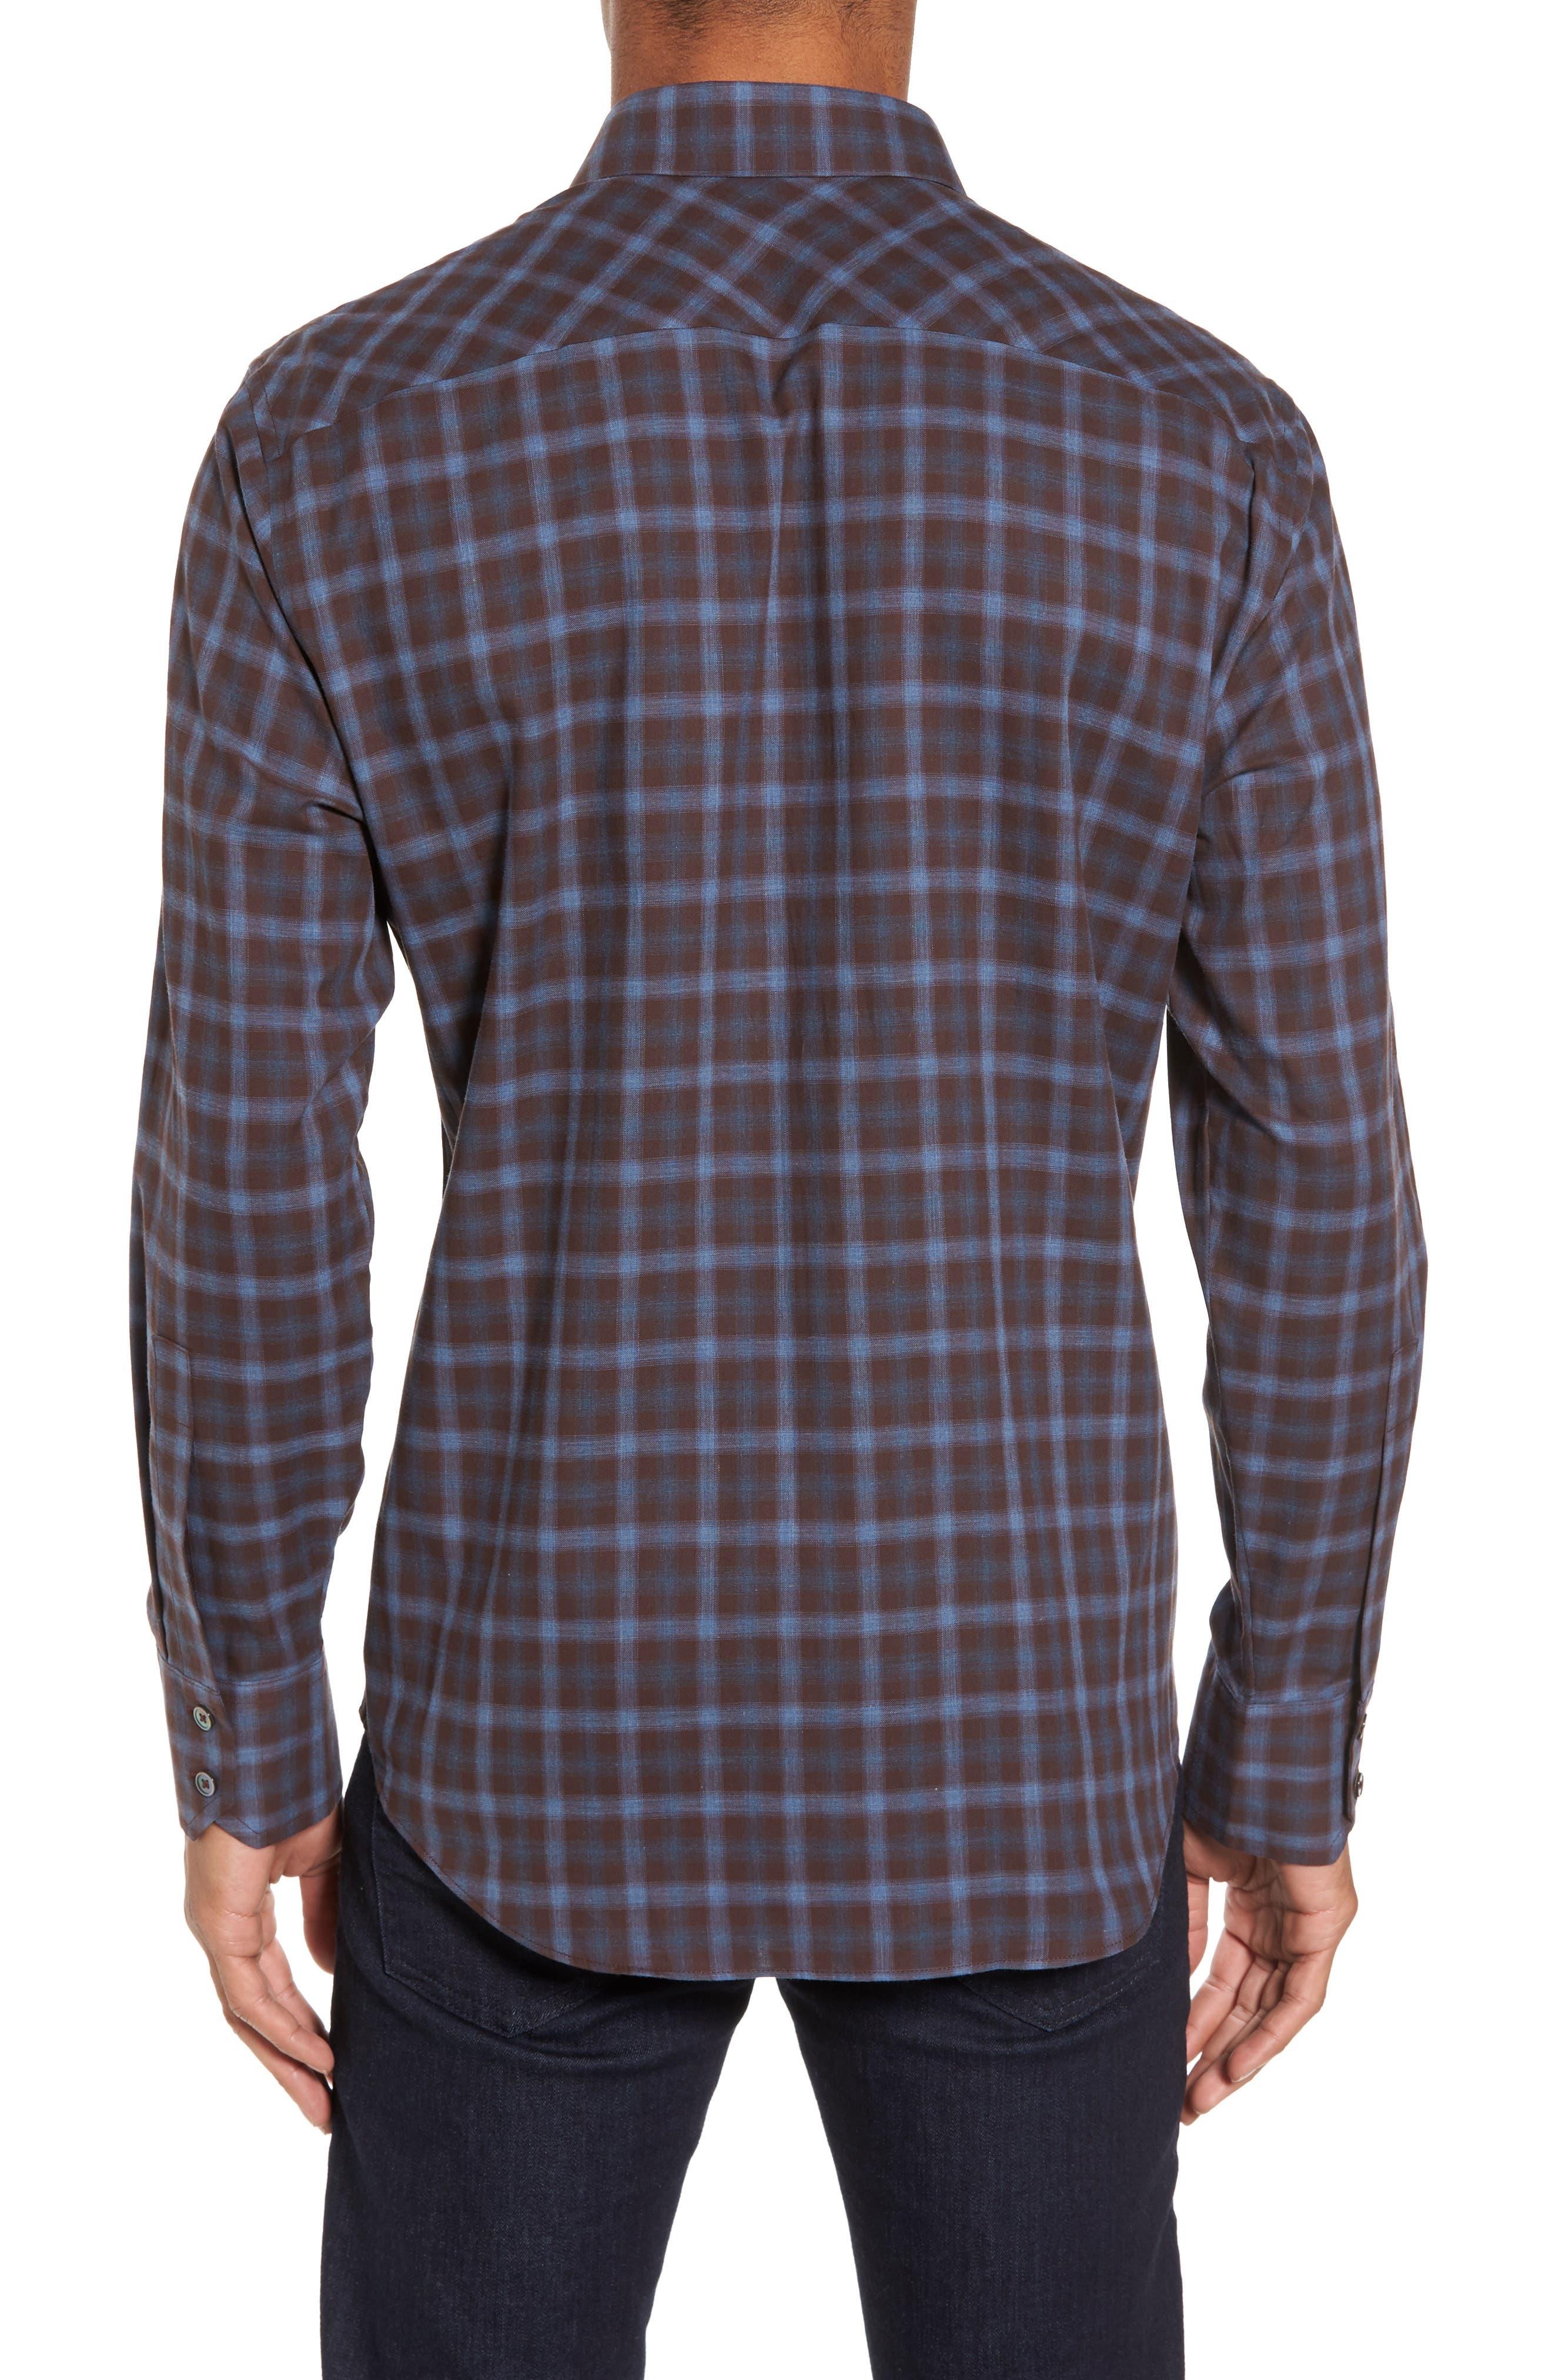 Fathollahi Slim Fit Plaid Sport Shirt,                             Alternate thumbnail 2, color,                             200